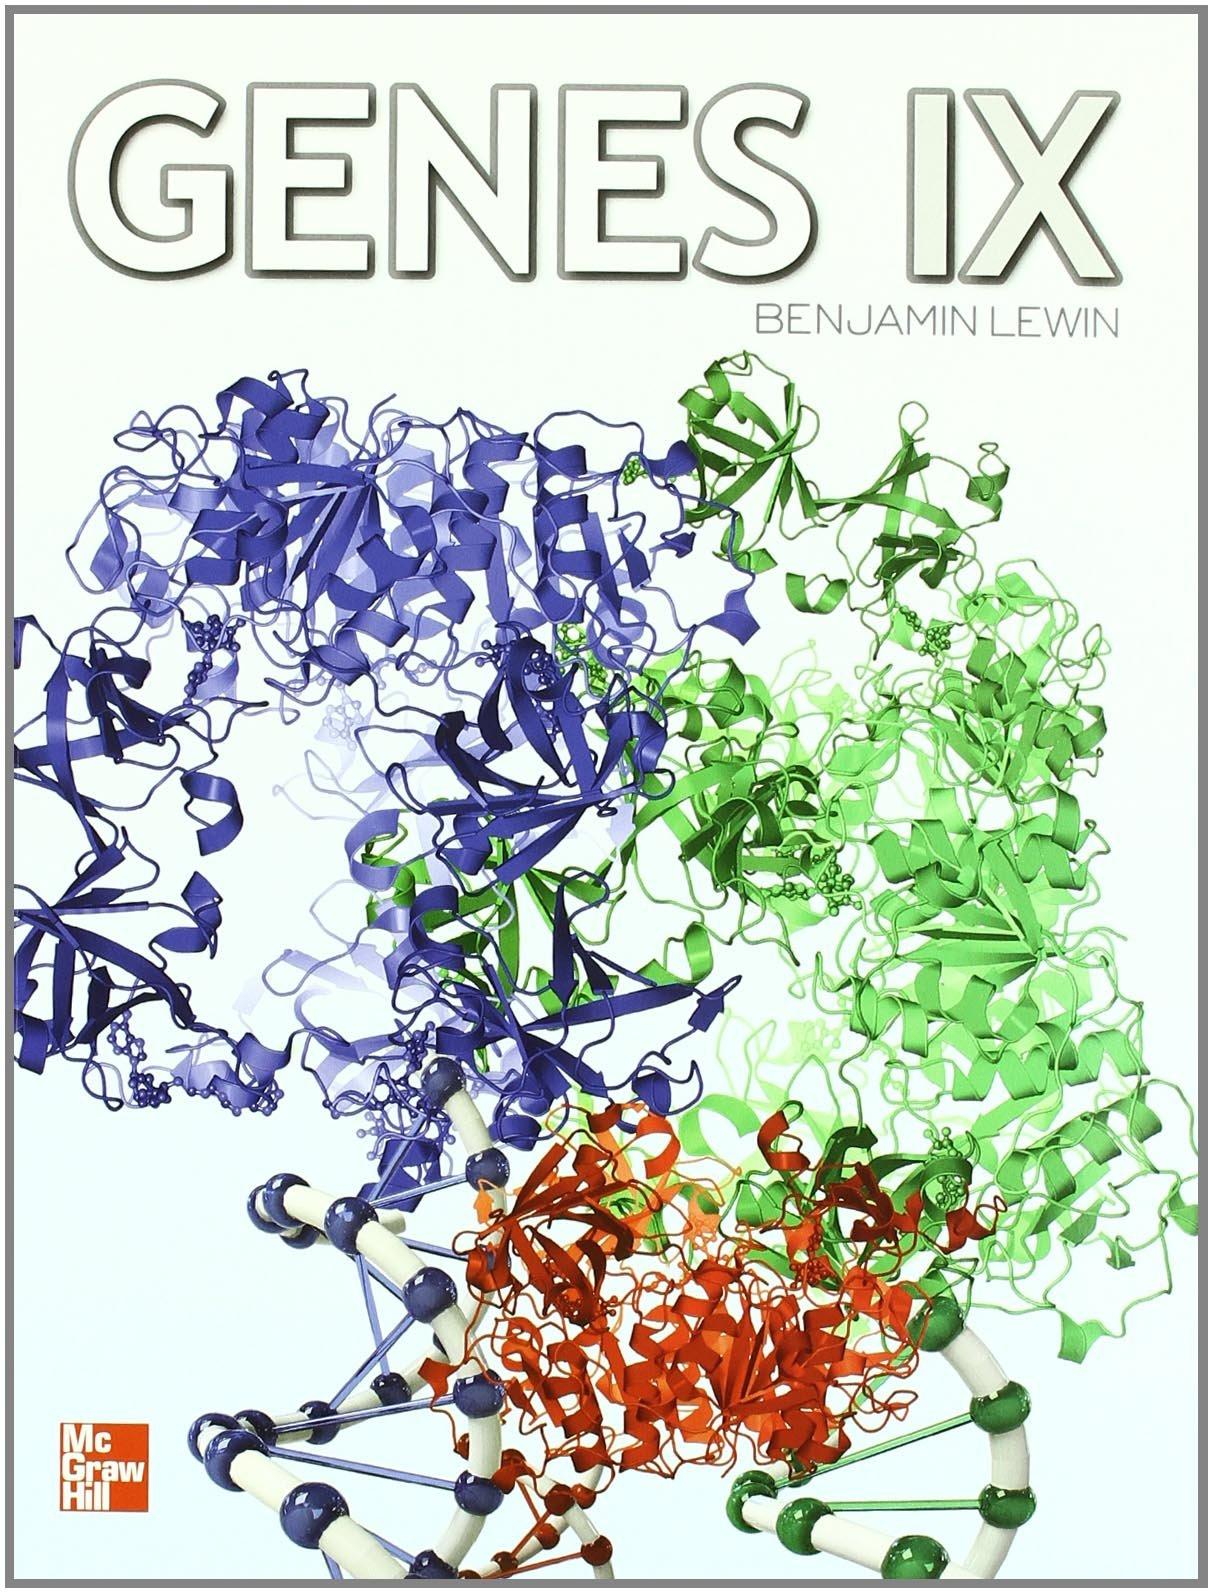 Genex IX